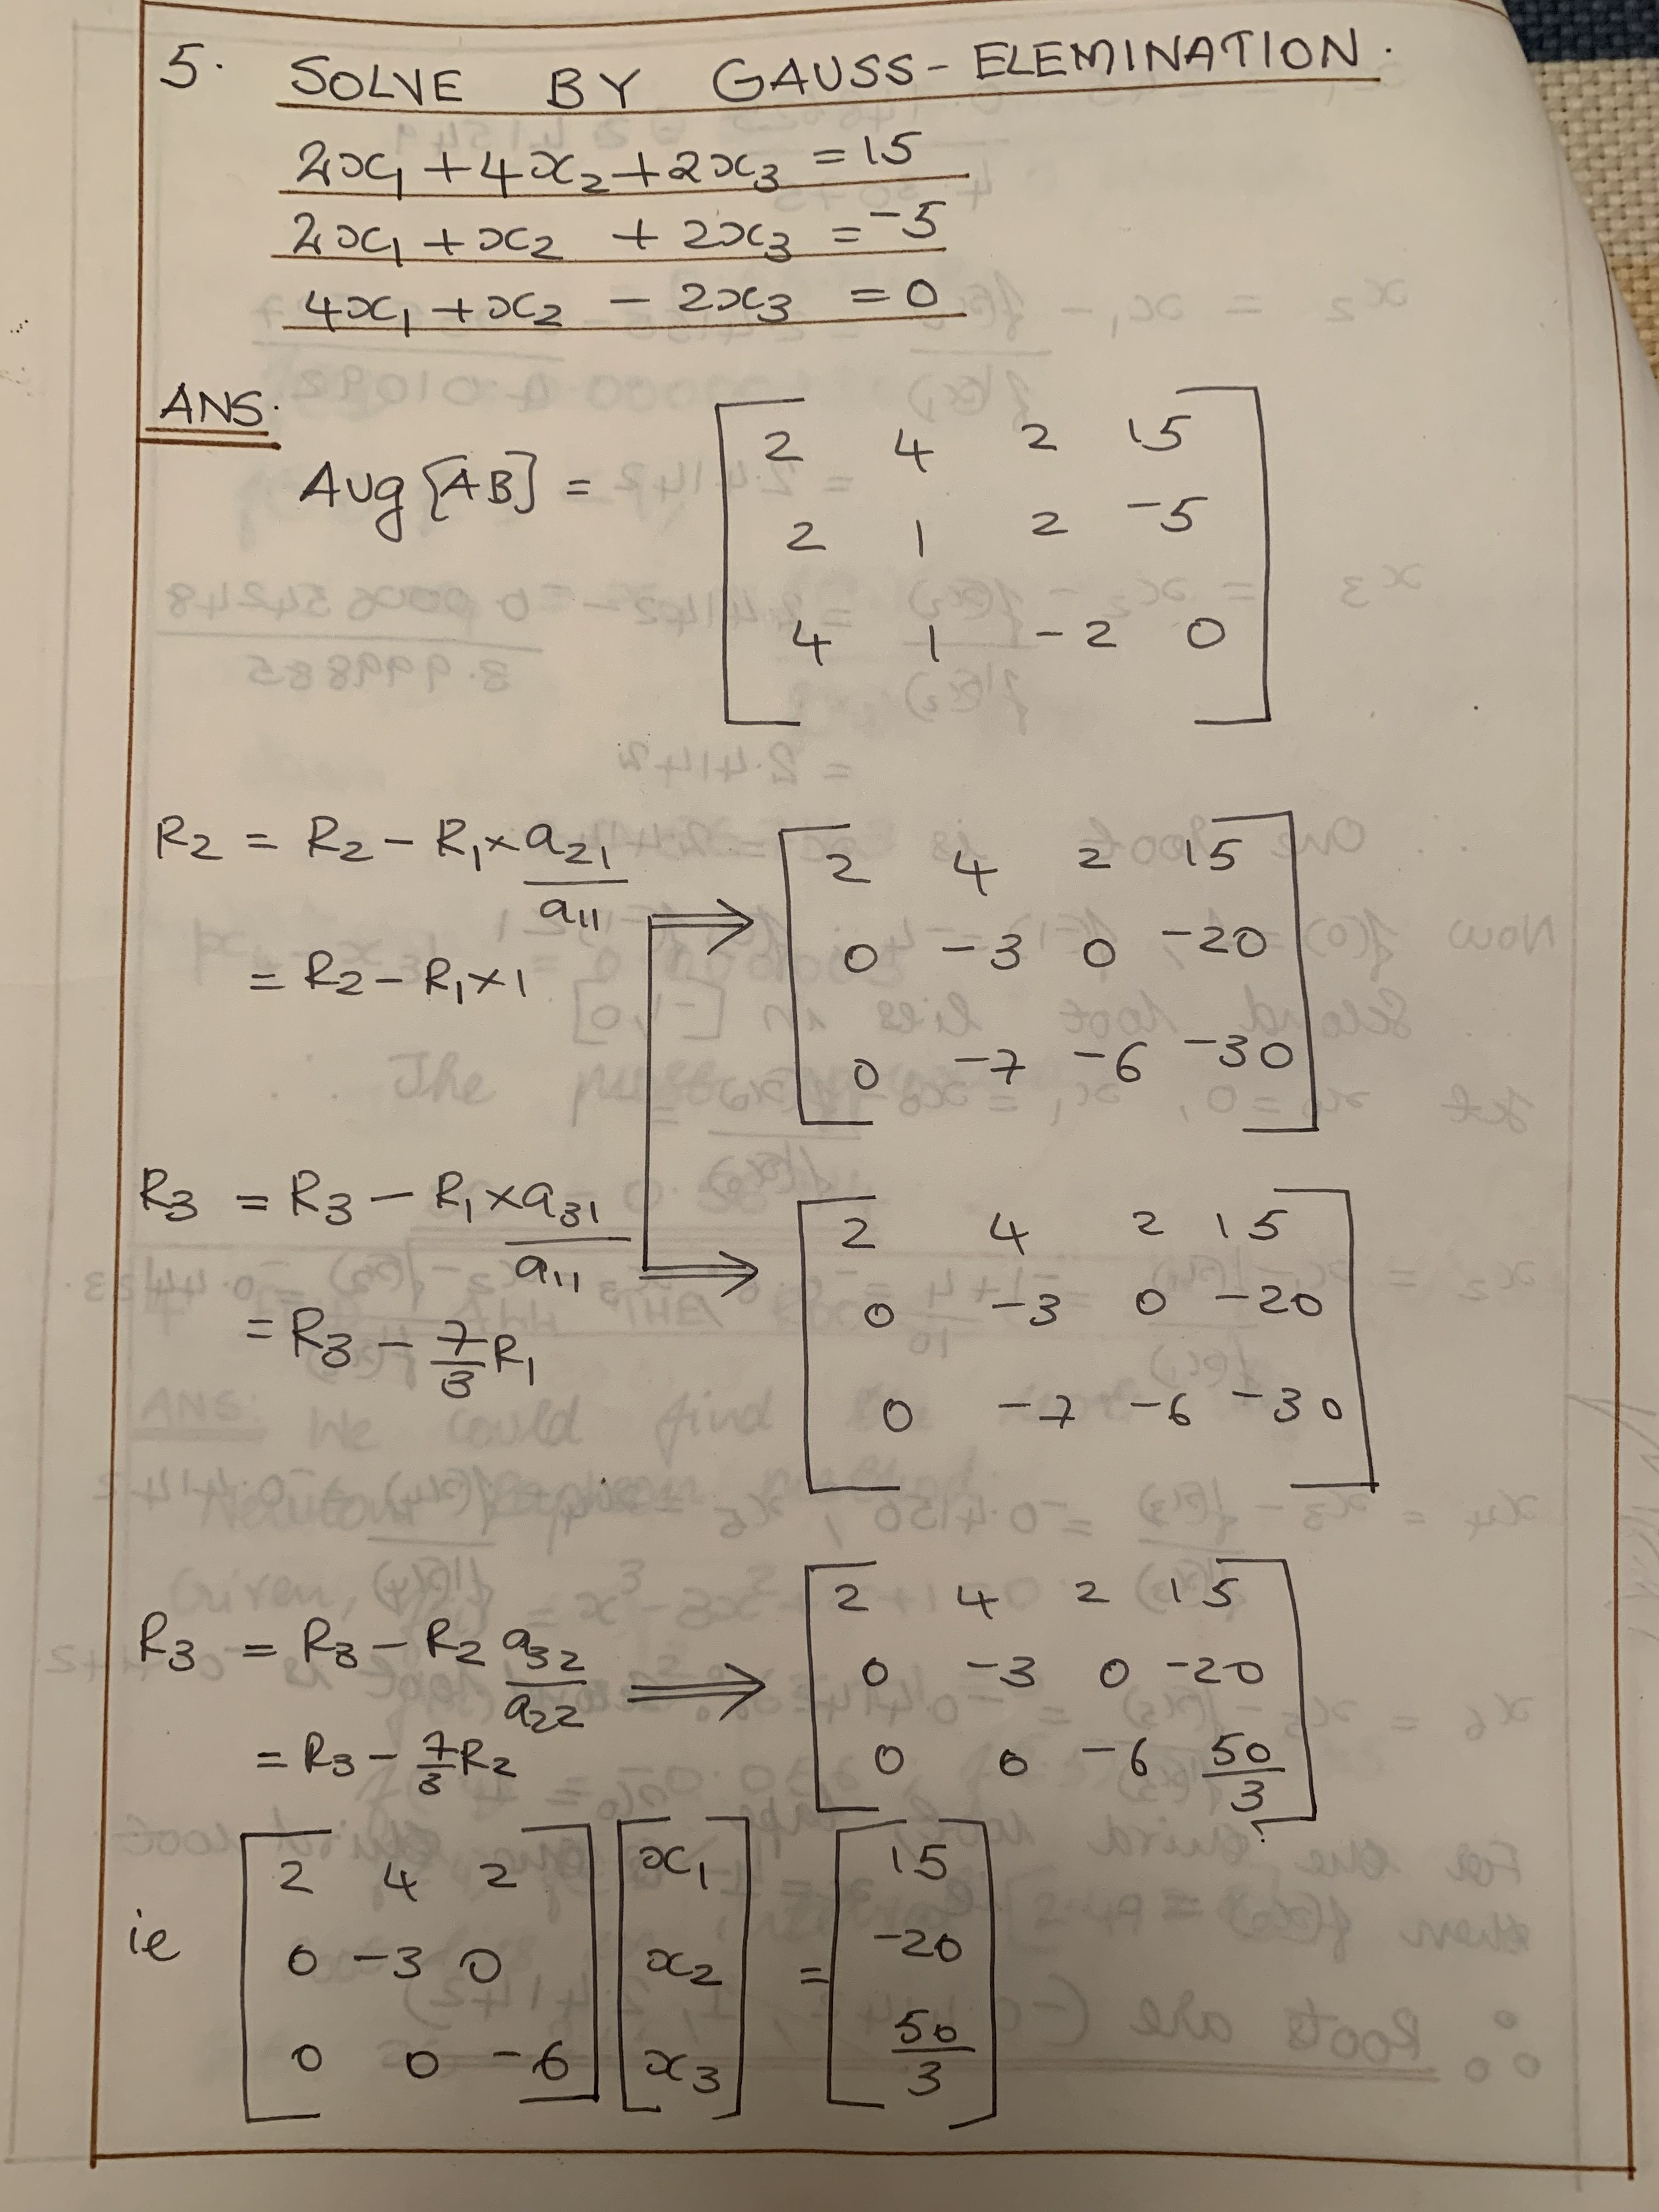 gauss-elimination-method1